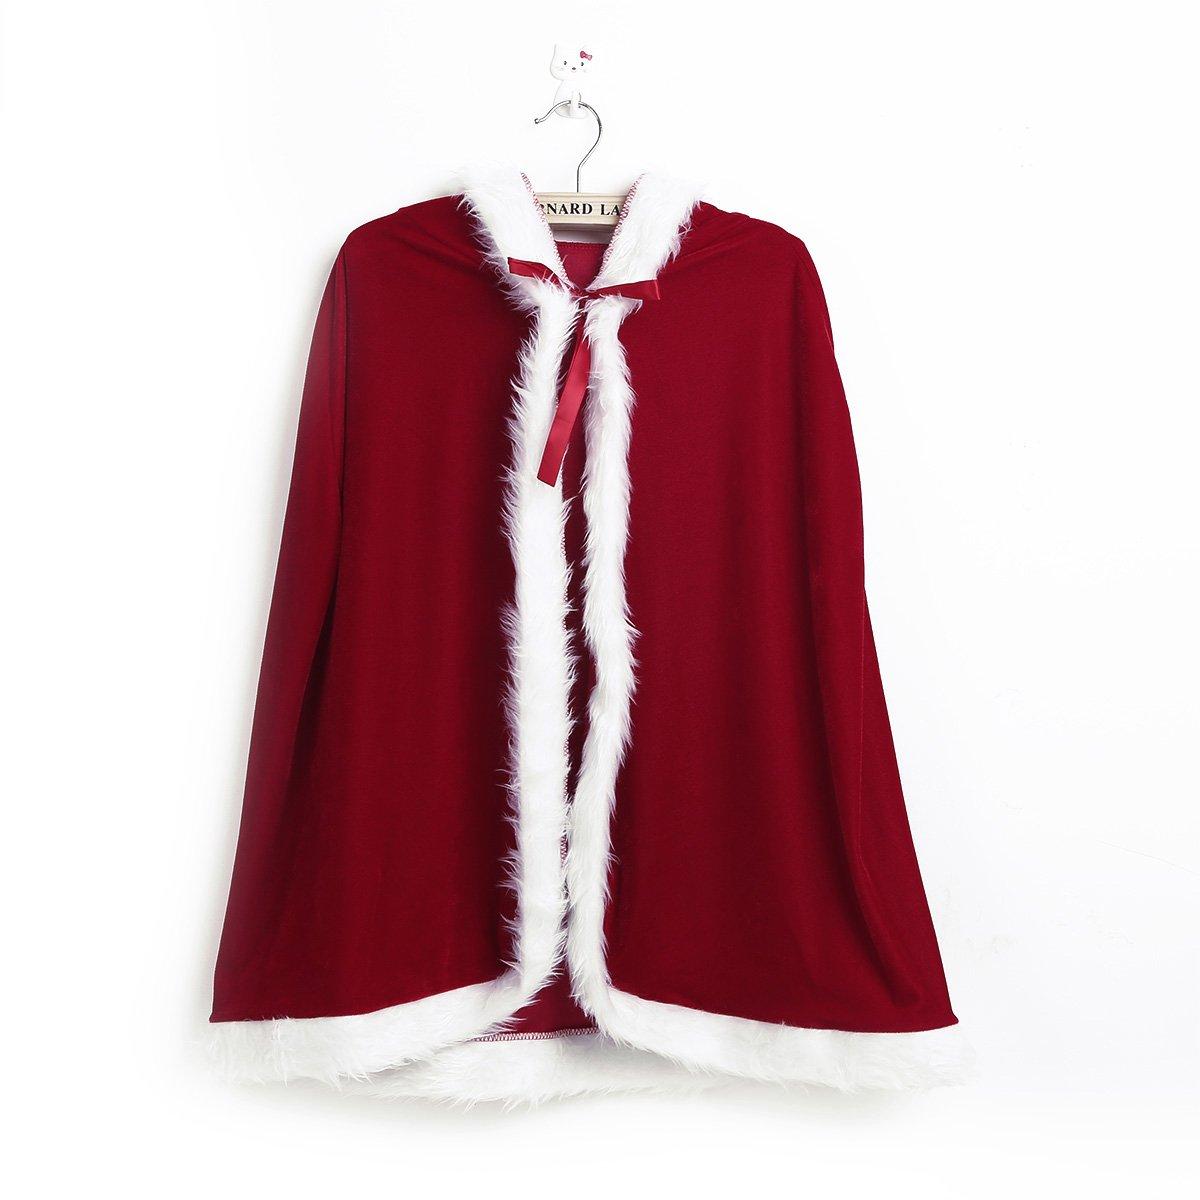 iiniim Kids Boys Girls Christmas Santa Cloak Velvet Hooded Cape Cosplay Costumes Red 3-4